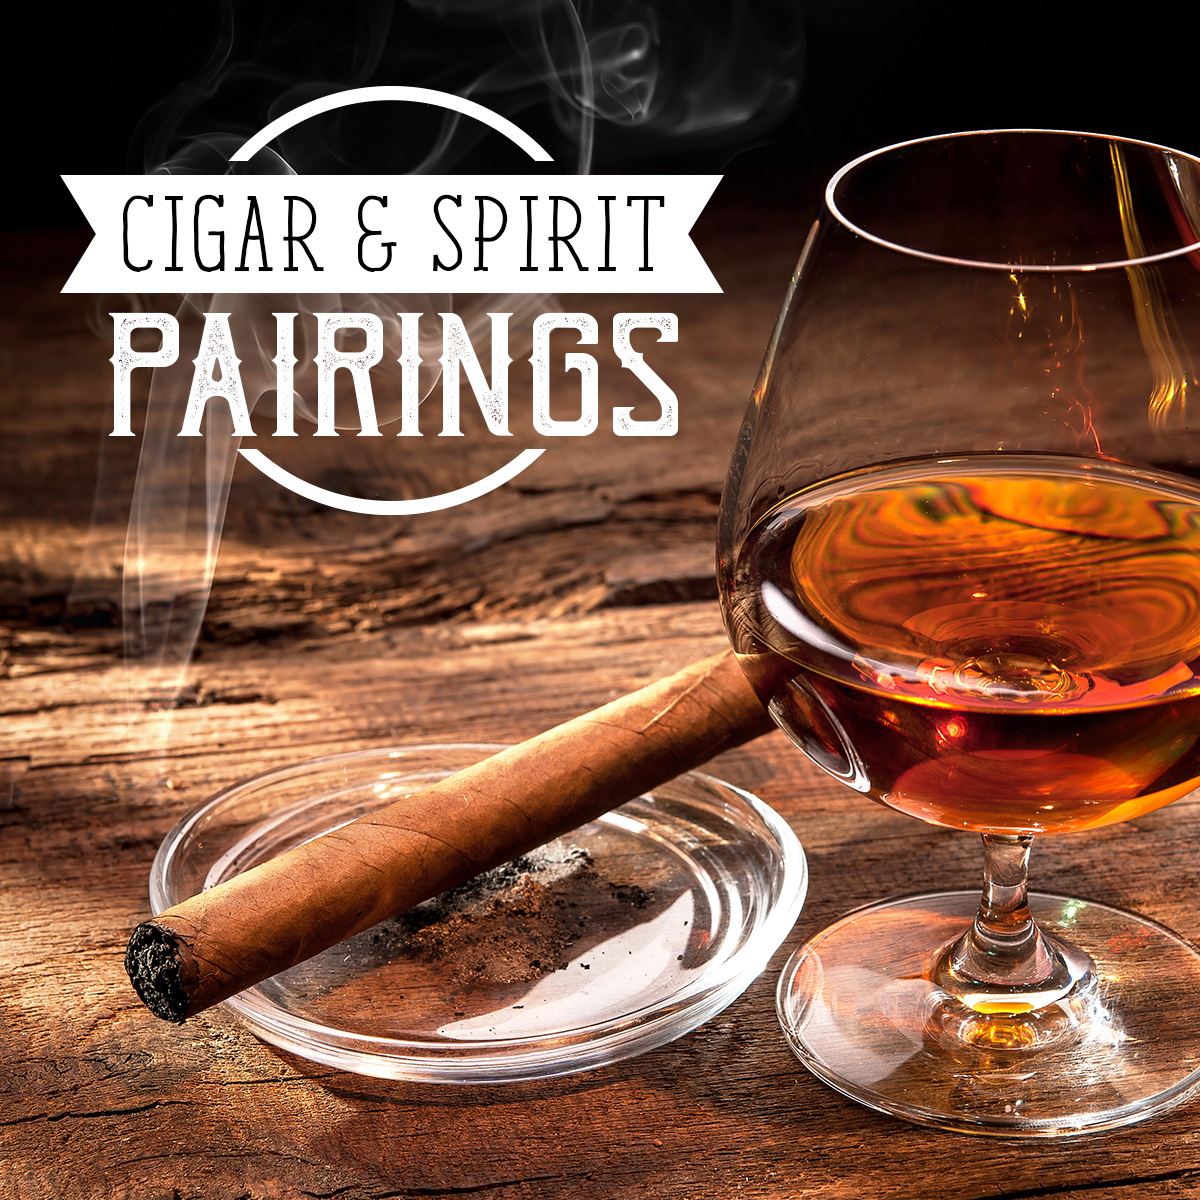 Cigar & Spirit Pairings, Spec's Wines, Spirits & Finer Foods